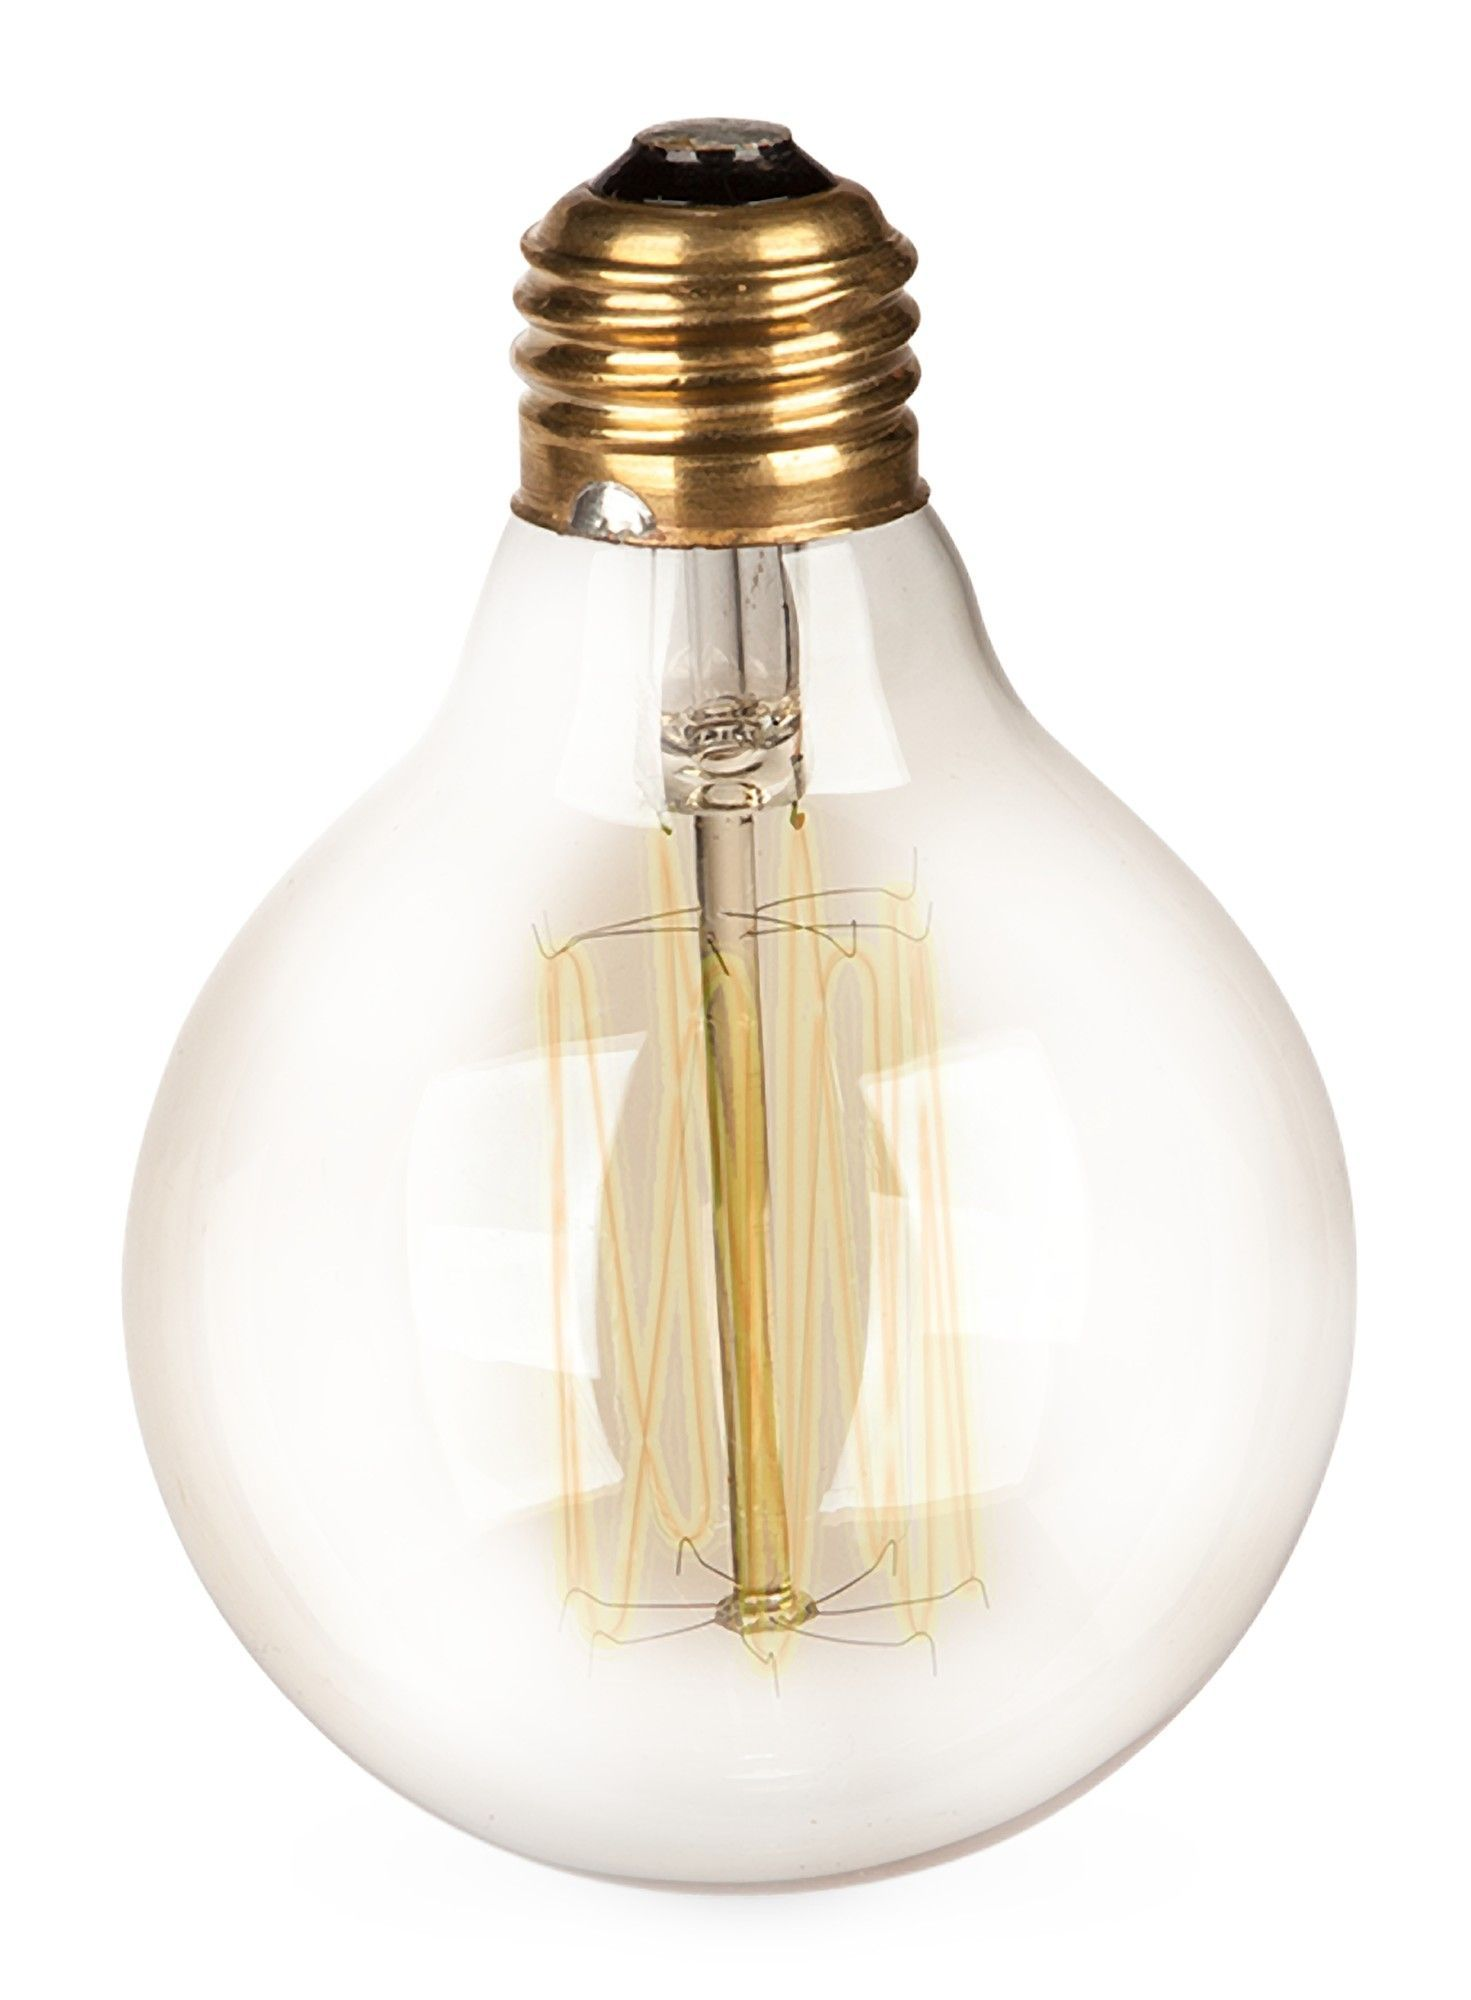 20 Watt Incandescent Light Bulb